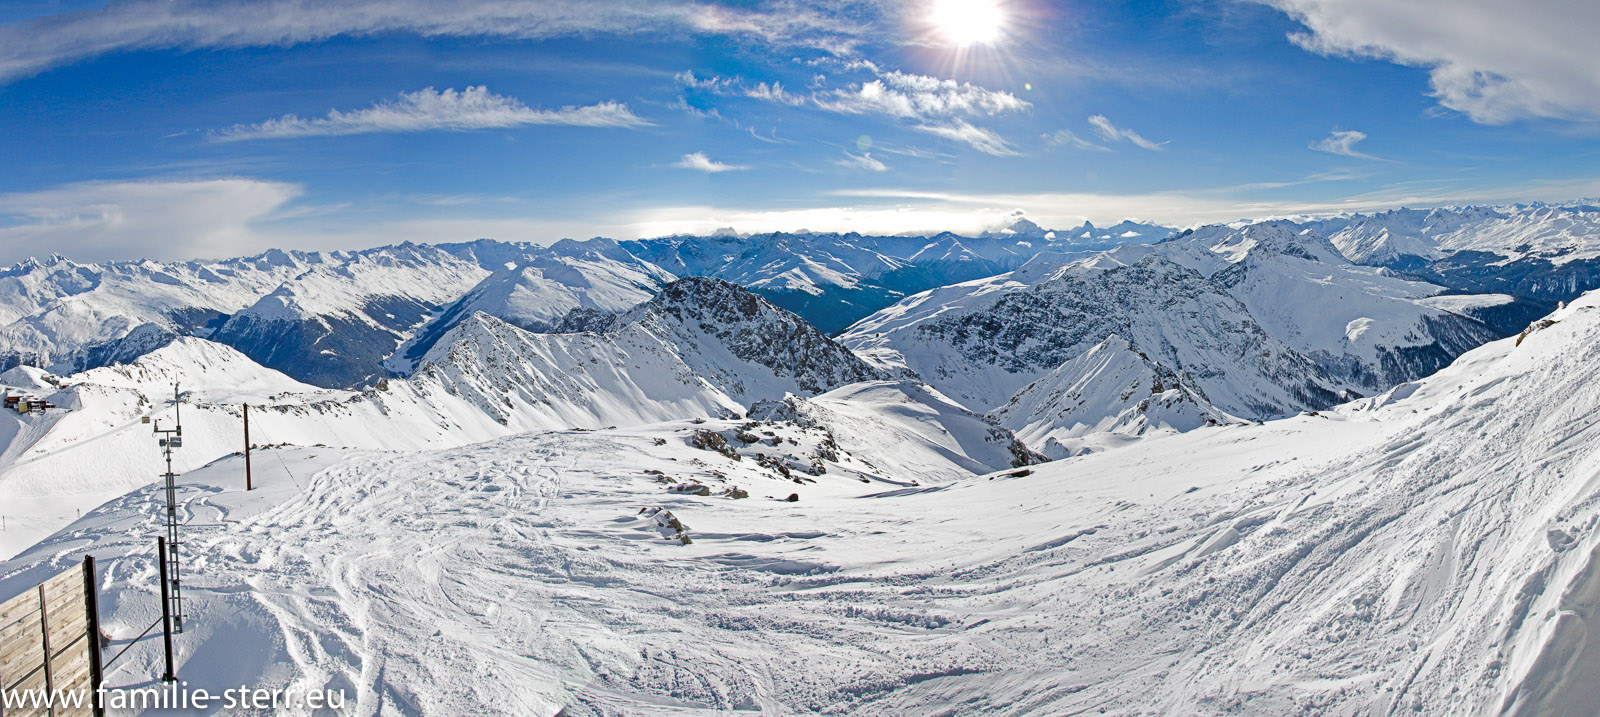 Weissfluh - Gipfel / Panorama SüdOst - Süd - SüdWest